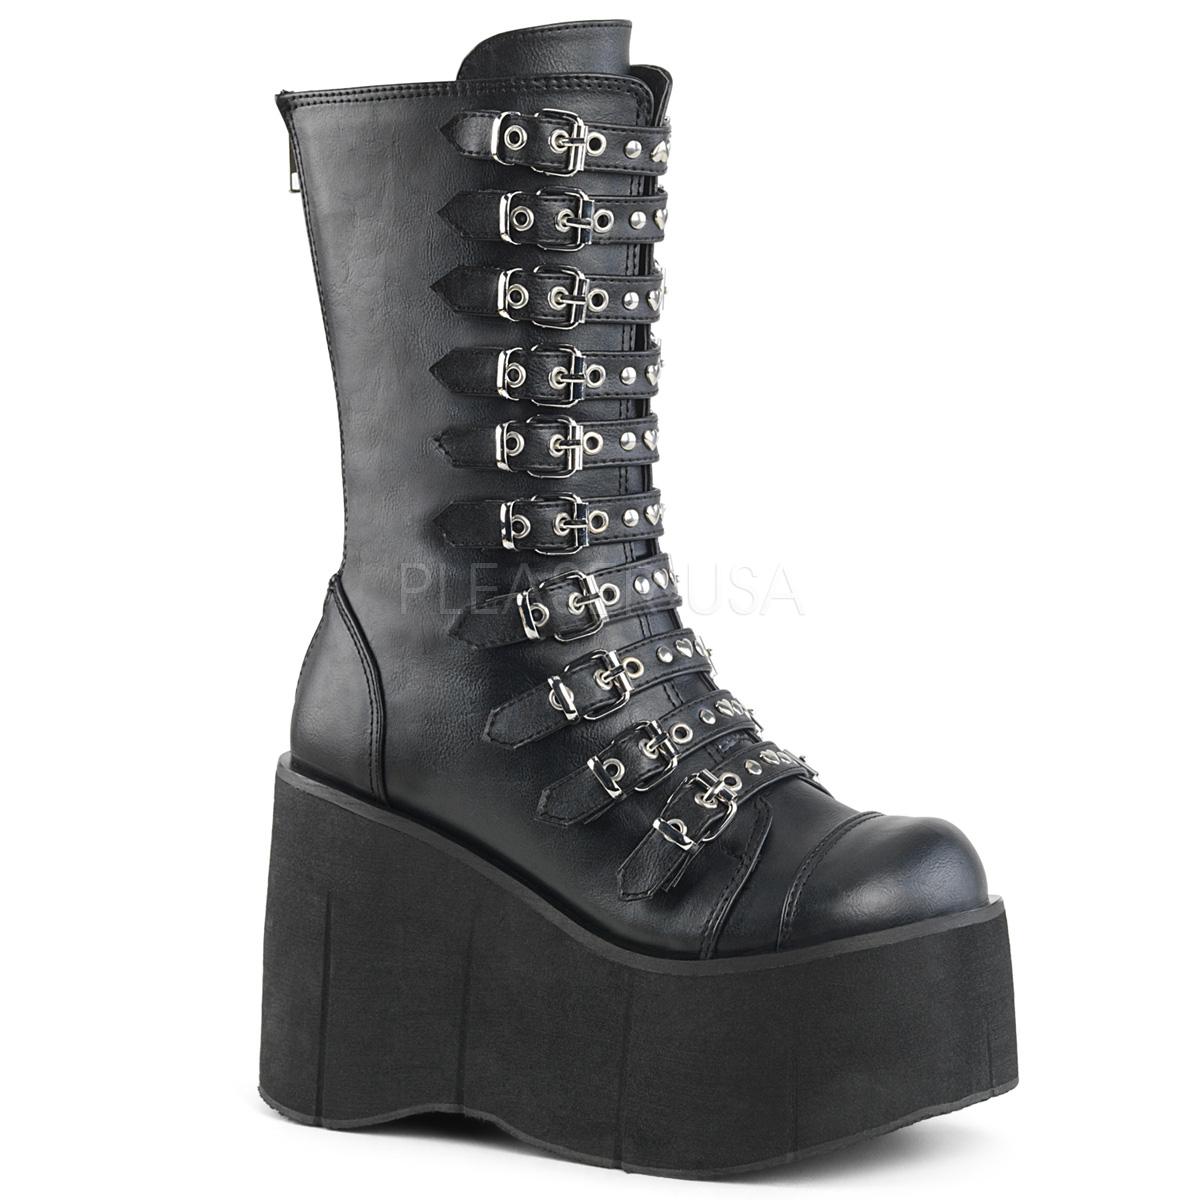 1d6a4db7a11b Leatherette-11-5-cm-DEMONIA-KERA-50-goth-boots-with-platform-10905 0.jpg